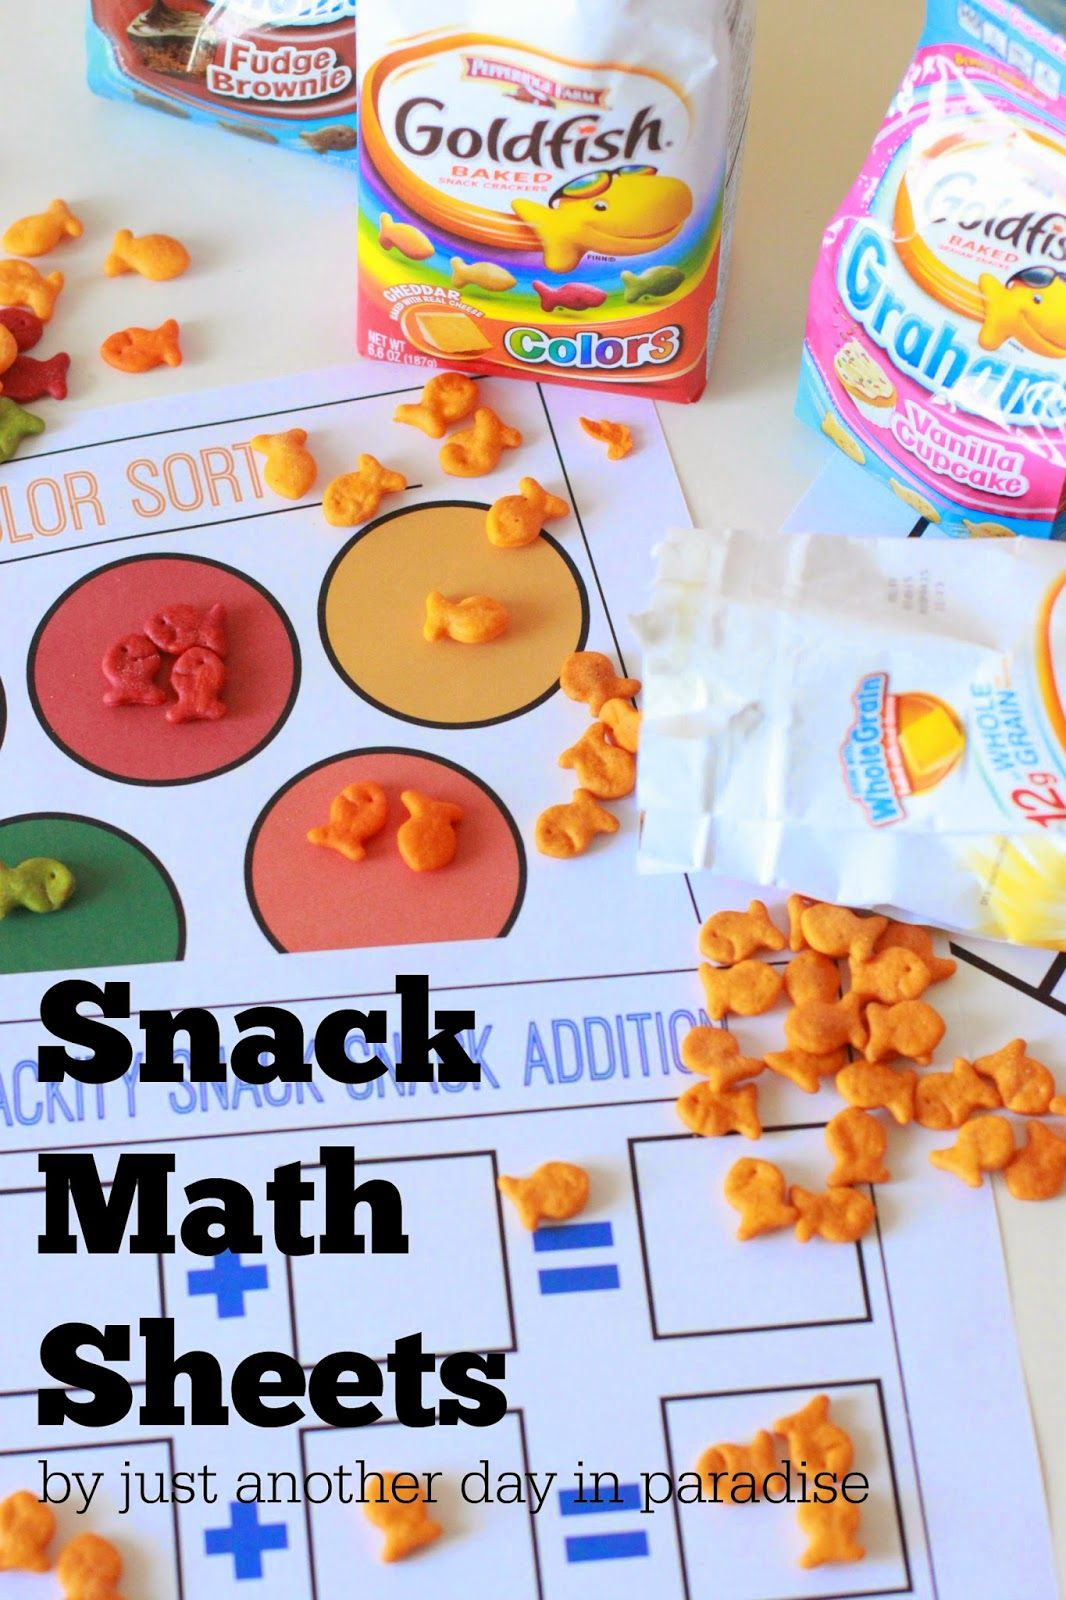 Goldfish Snack Math Sheets